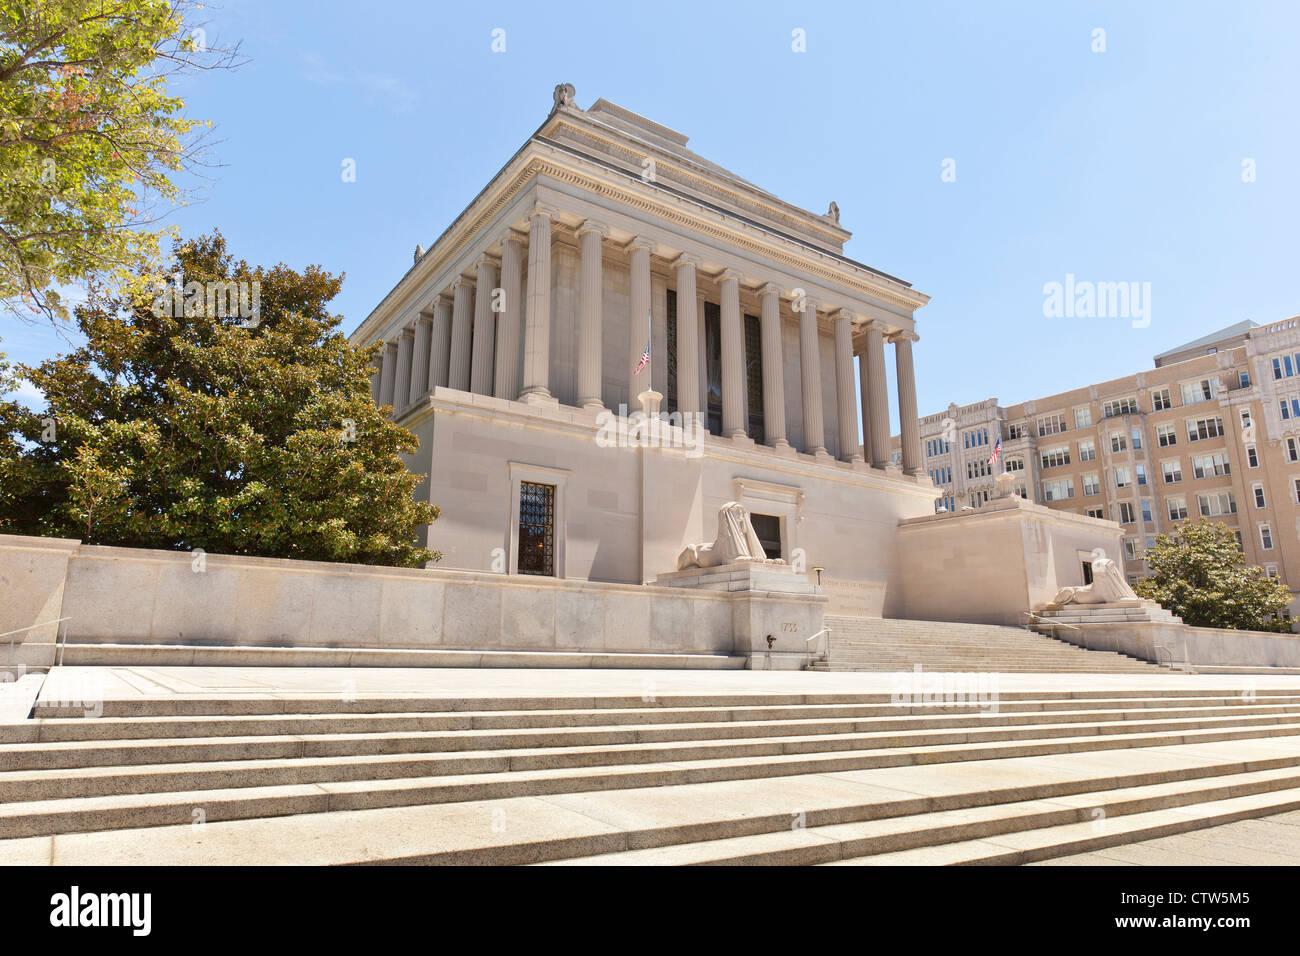 The House of the Temple - Scottish Rite of Freemasonry building, Washington, DC - Stock Image